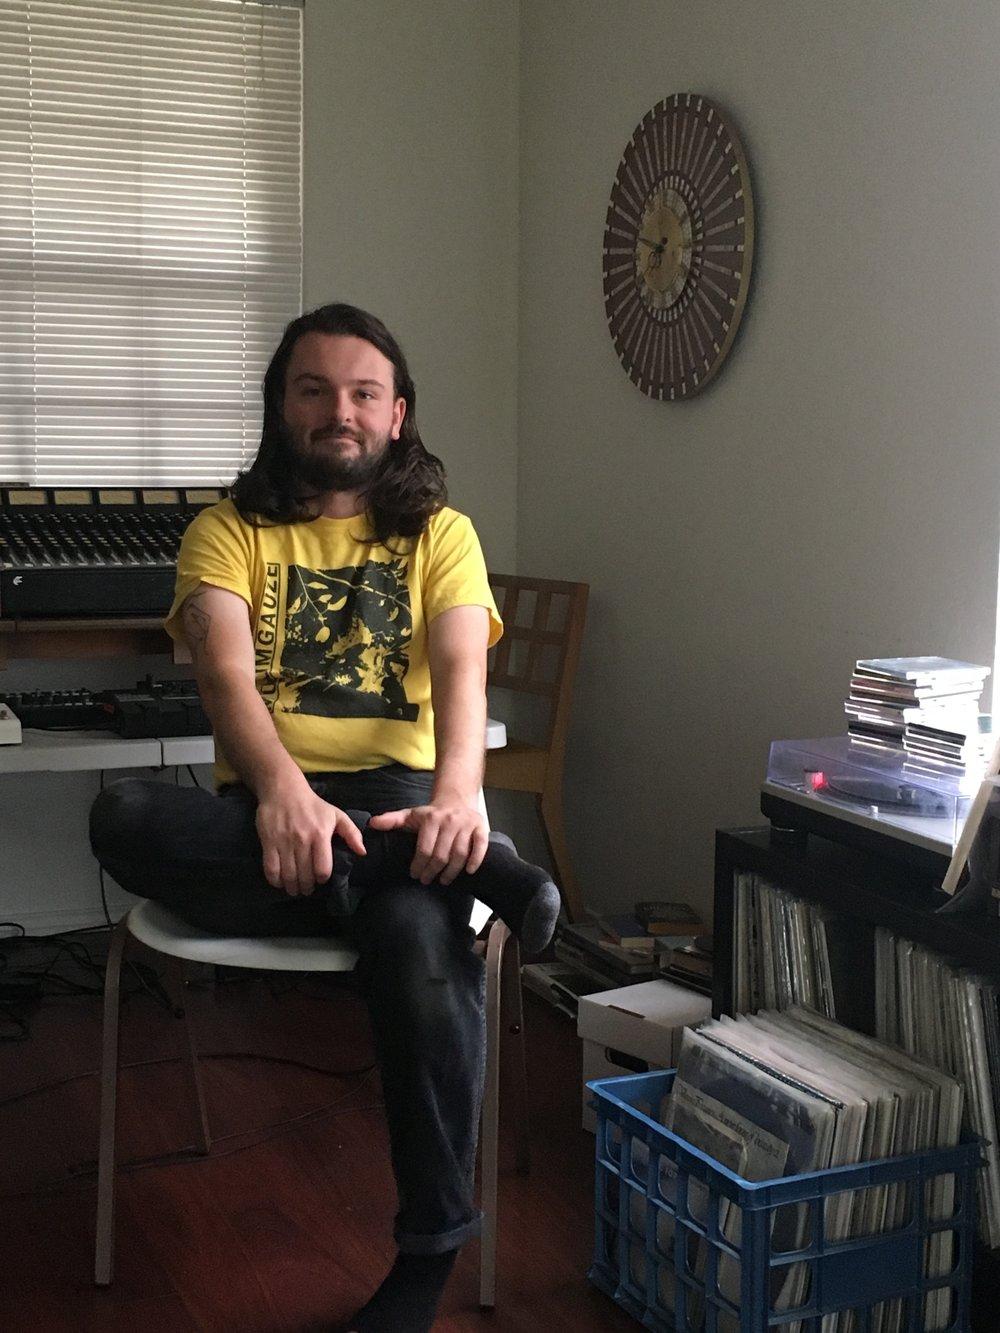 S. English - Shane English -Texas based producer and engineer of Eminent Domain.